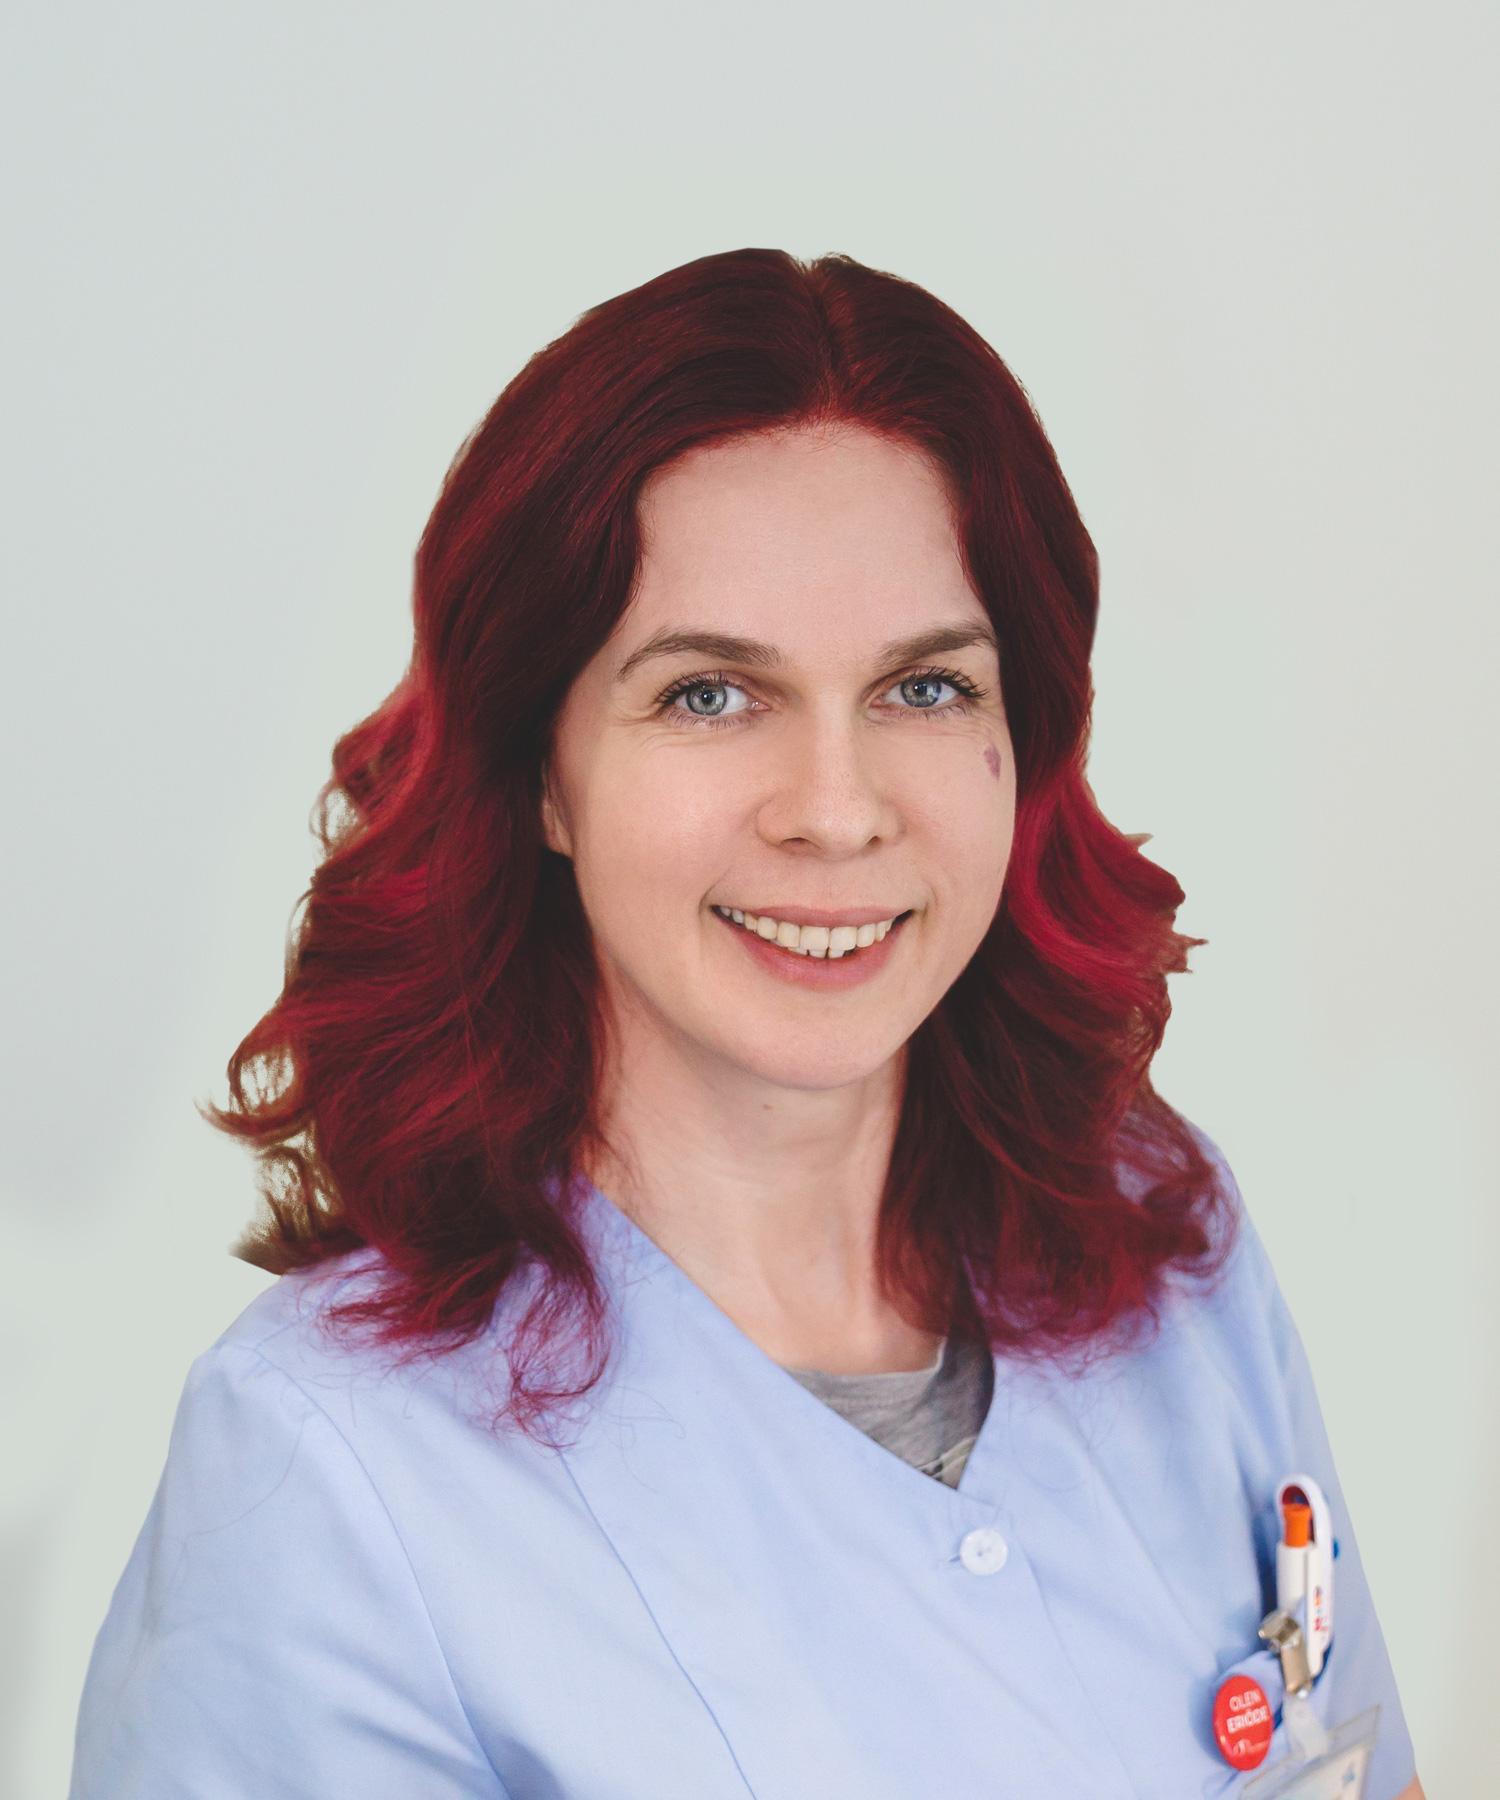 Laura Oisalu